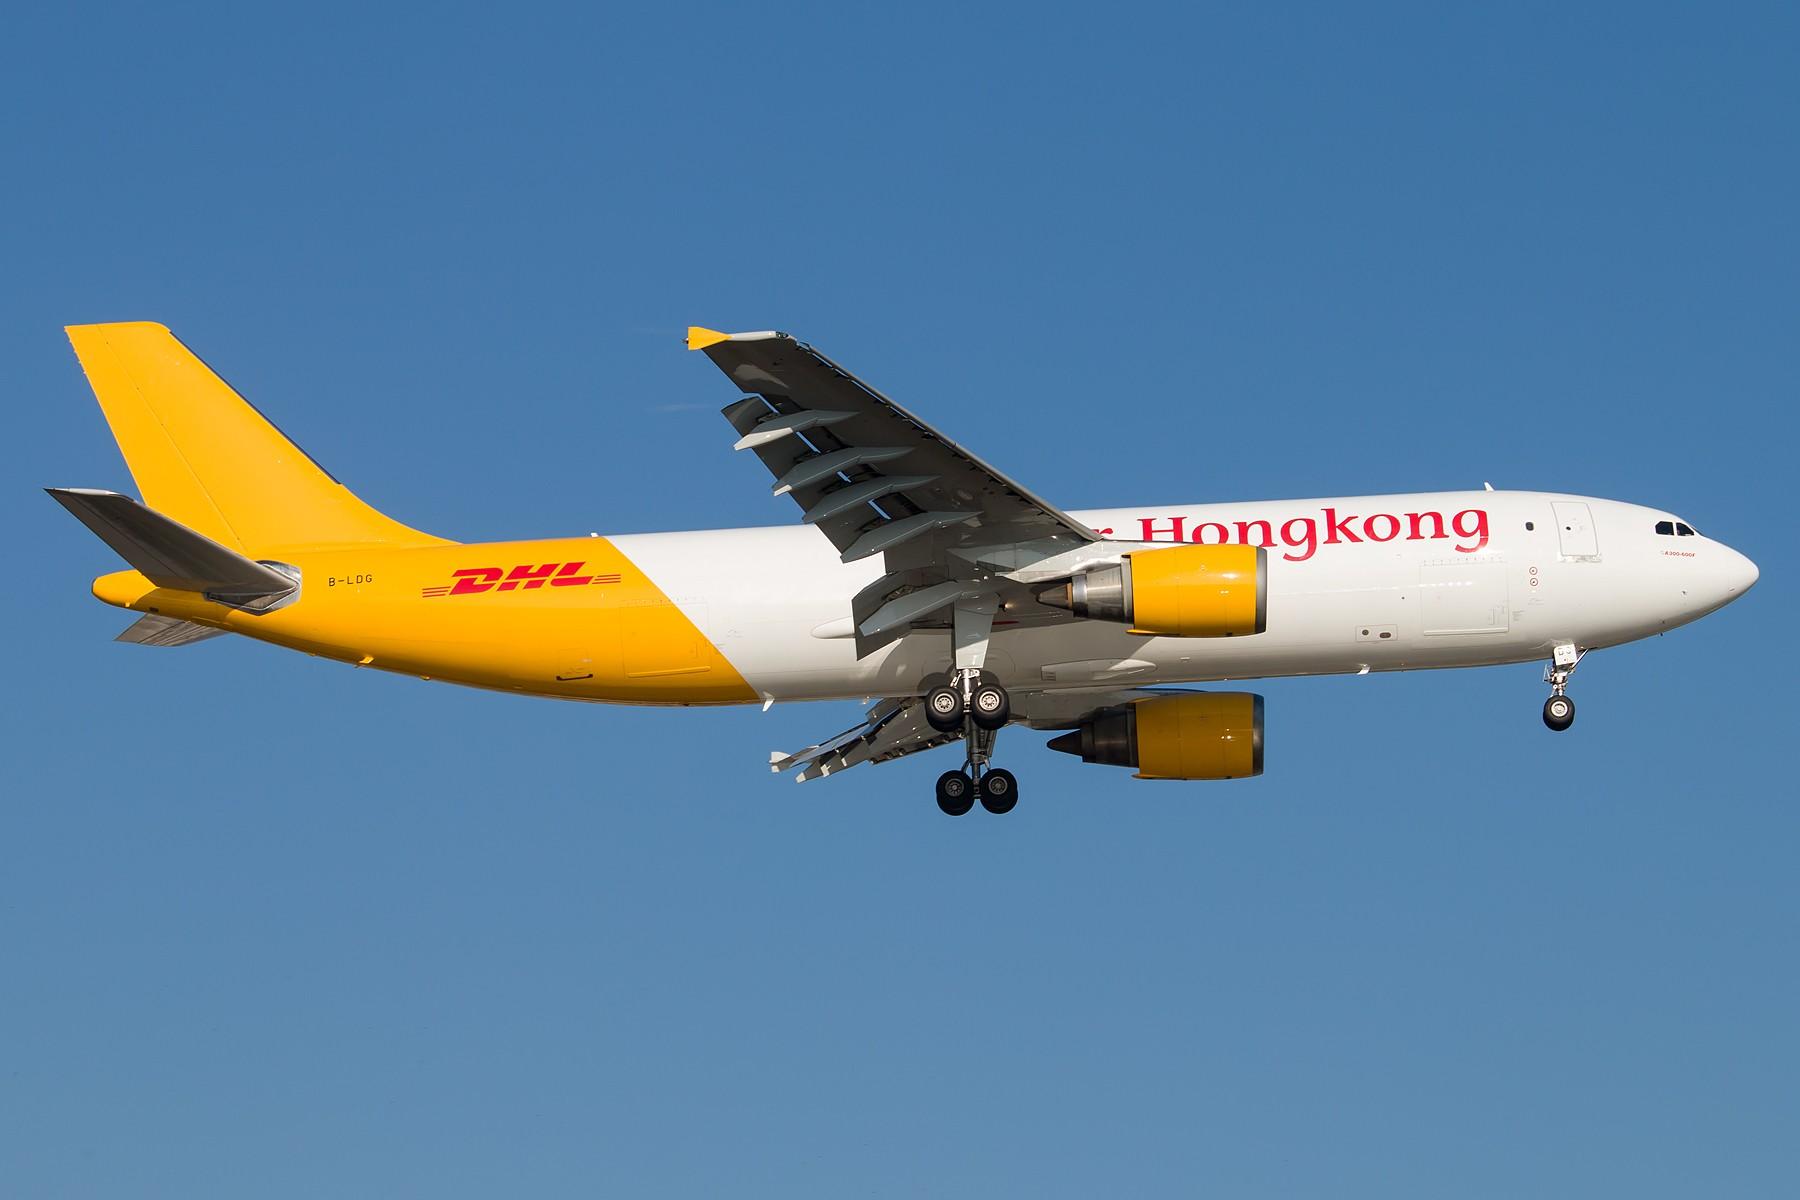 Re:[原创]亮亮哒 1800*1200 [5pics] AIRBUS A300F4-600R B-LDG 中国北京首都国际机场